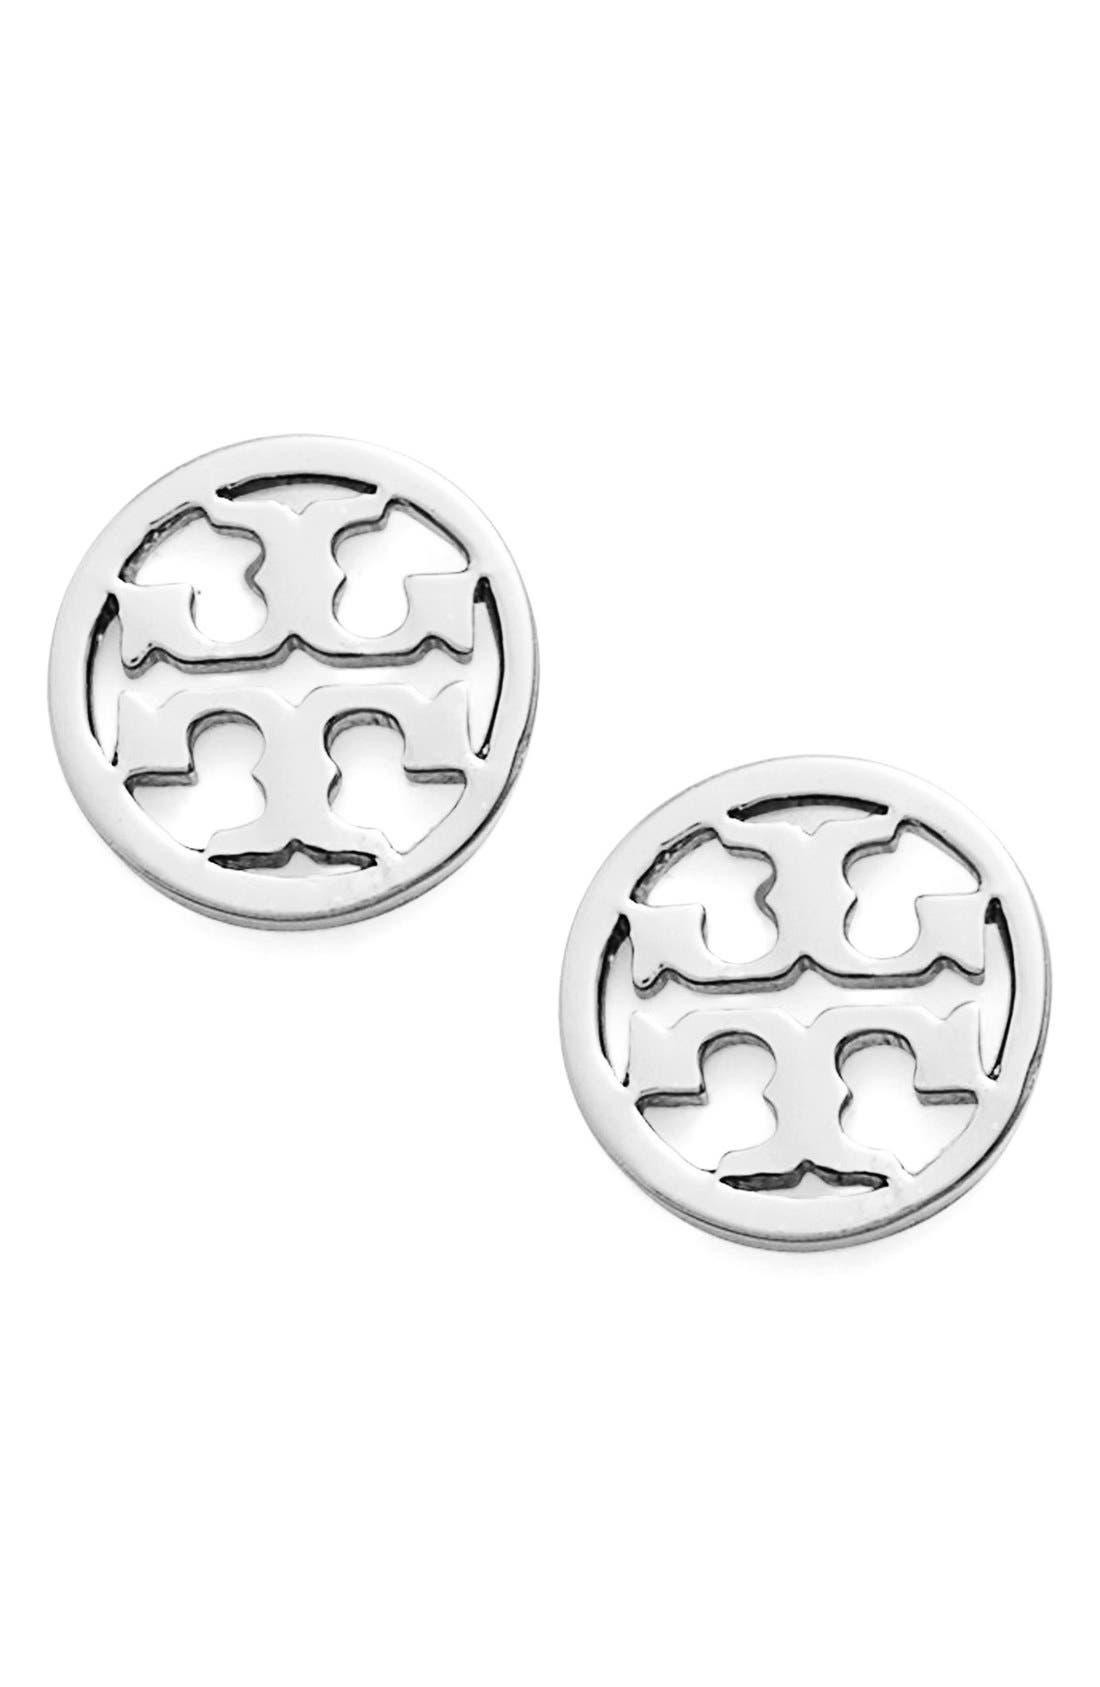 Alternate Image 1 Selected - Tory Burch Circle Logo Stud Earrings